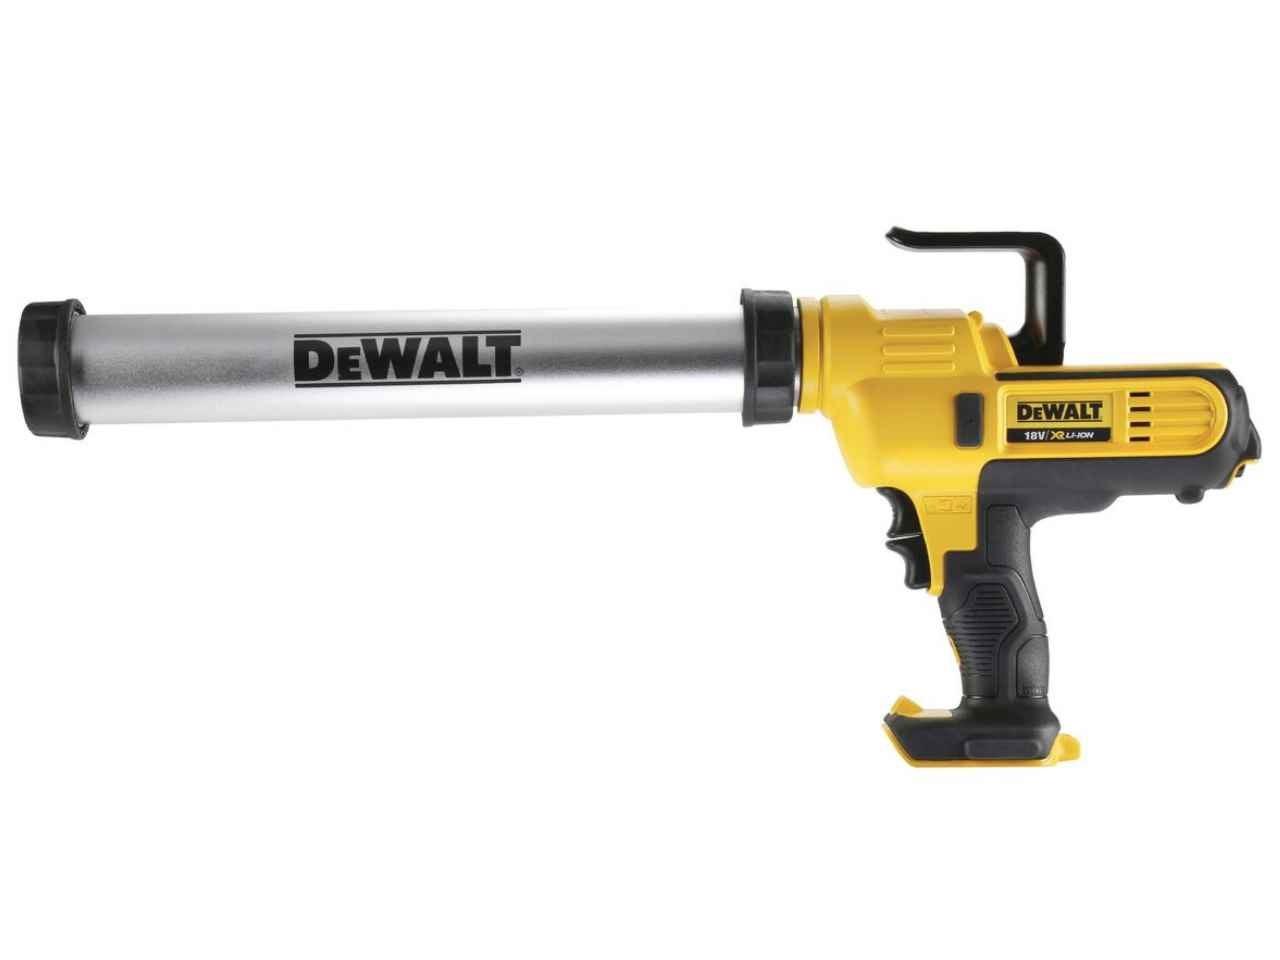 DeWalt DCE580N-XJ 18V XR Caulk Gun 600ML Bare Unit